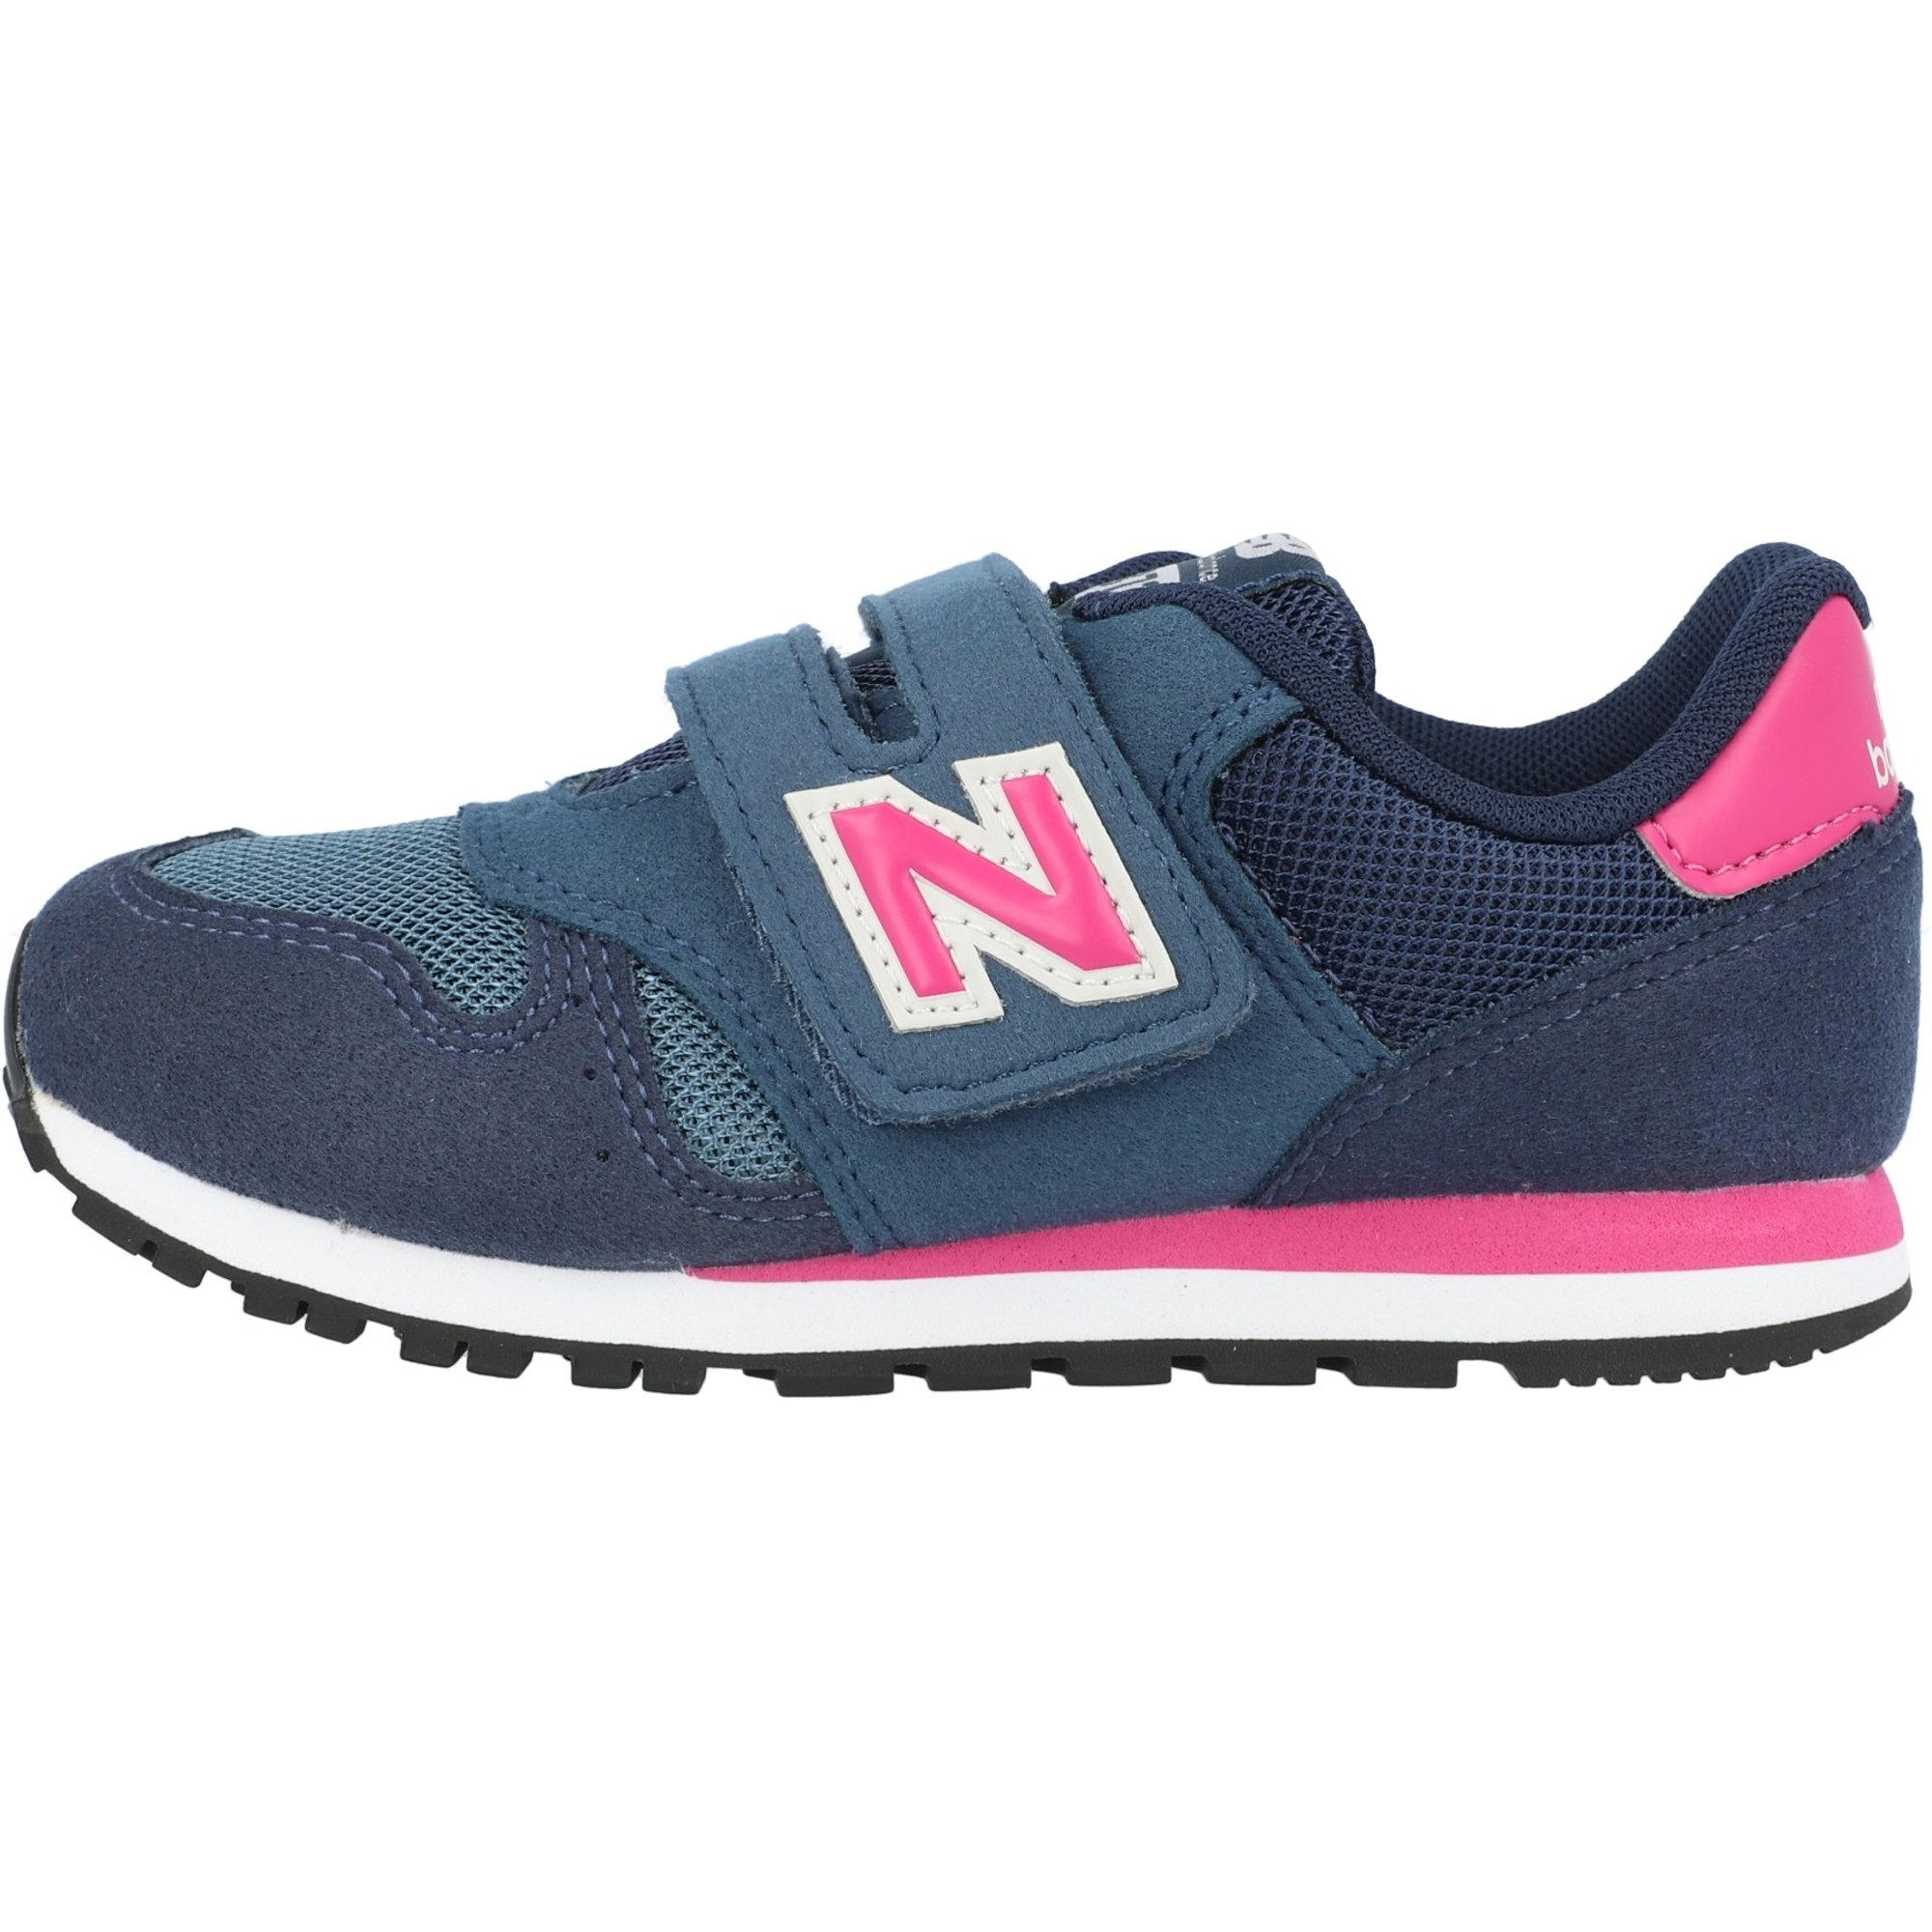 New Balance 373 Blau/Rosa (Stone Blue/Exuberant Pink) Veloursleder Kinder